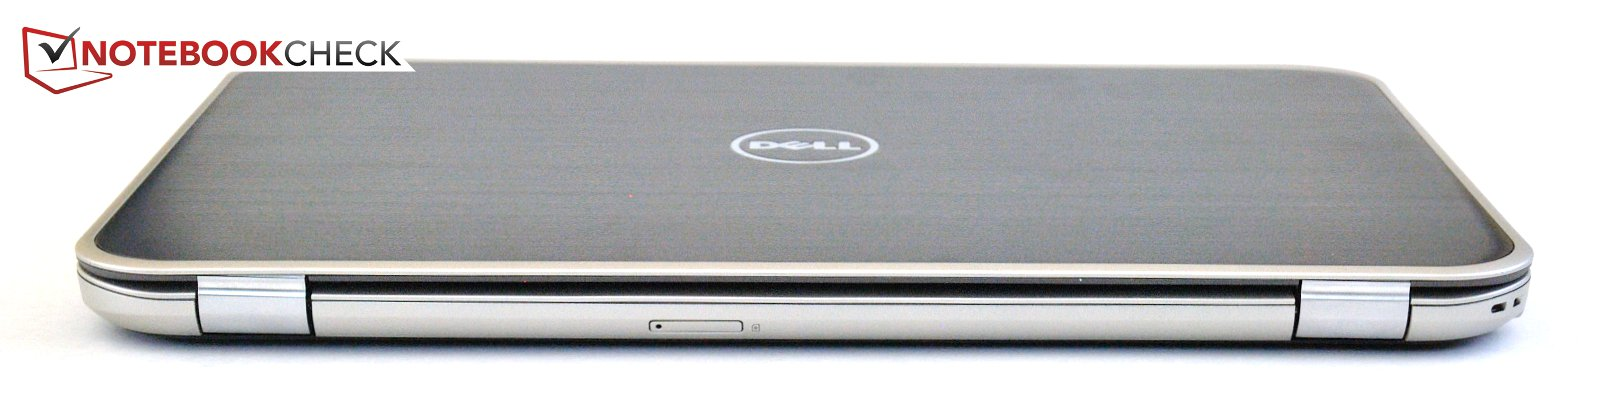 Dell Inspiron 14Z 5423 Notebook 5560 HSPA+ Mini Card Driver for Windows 7